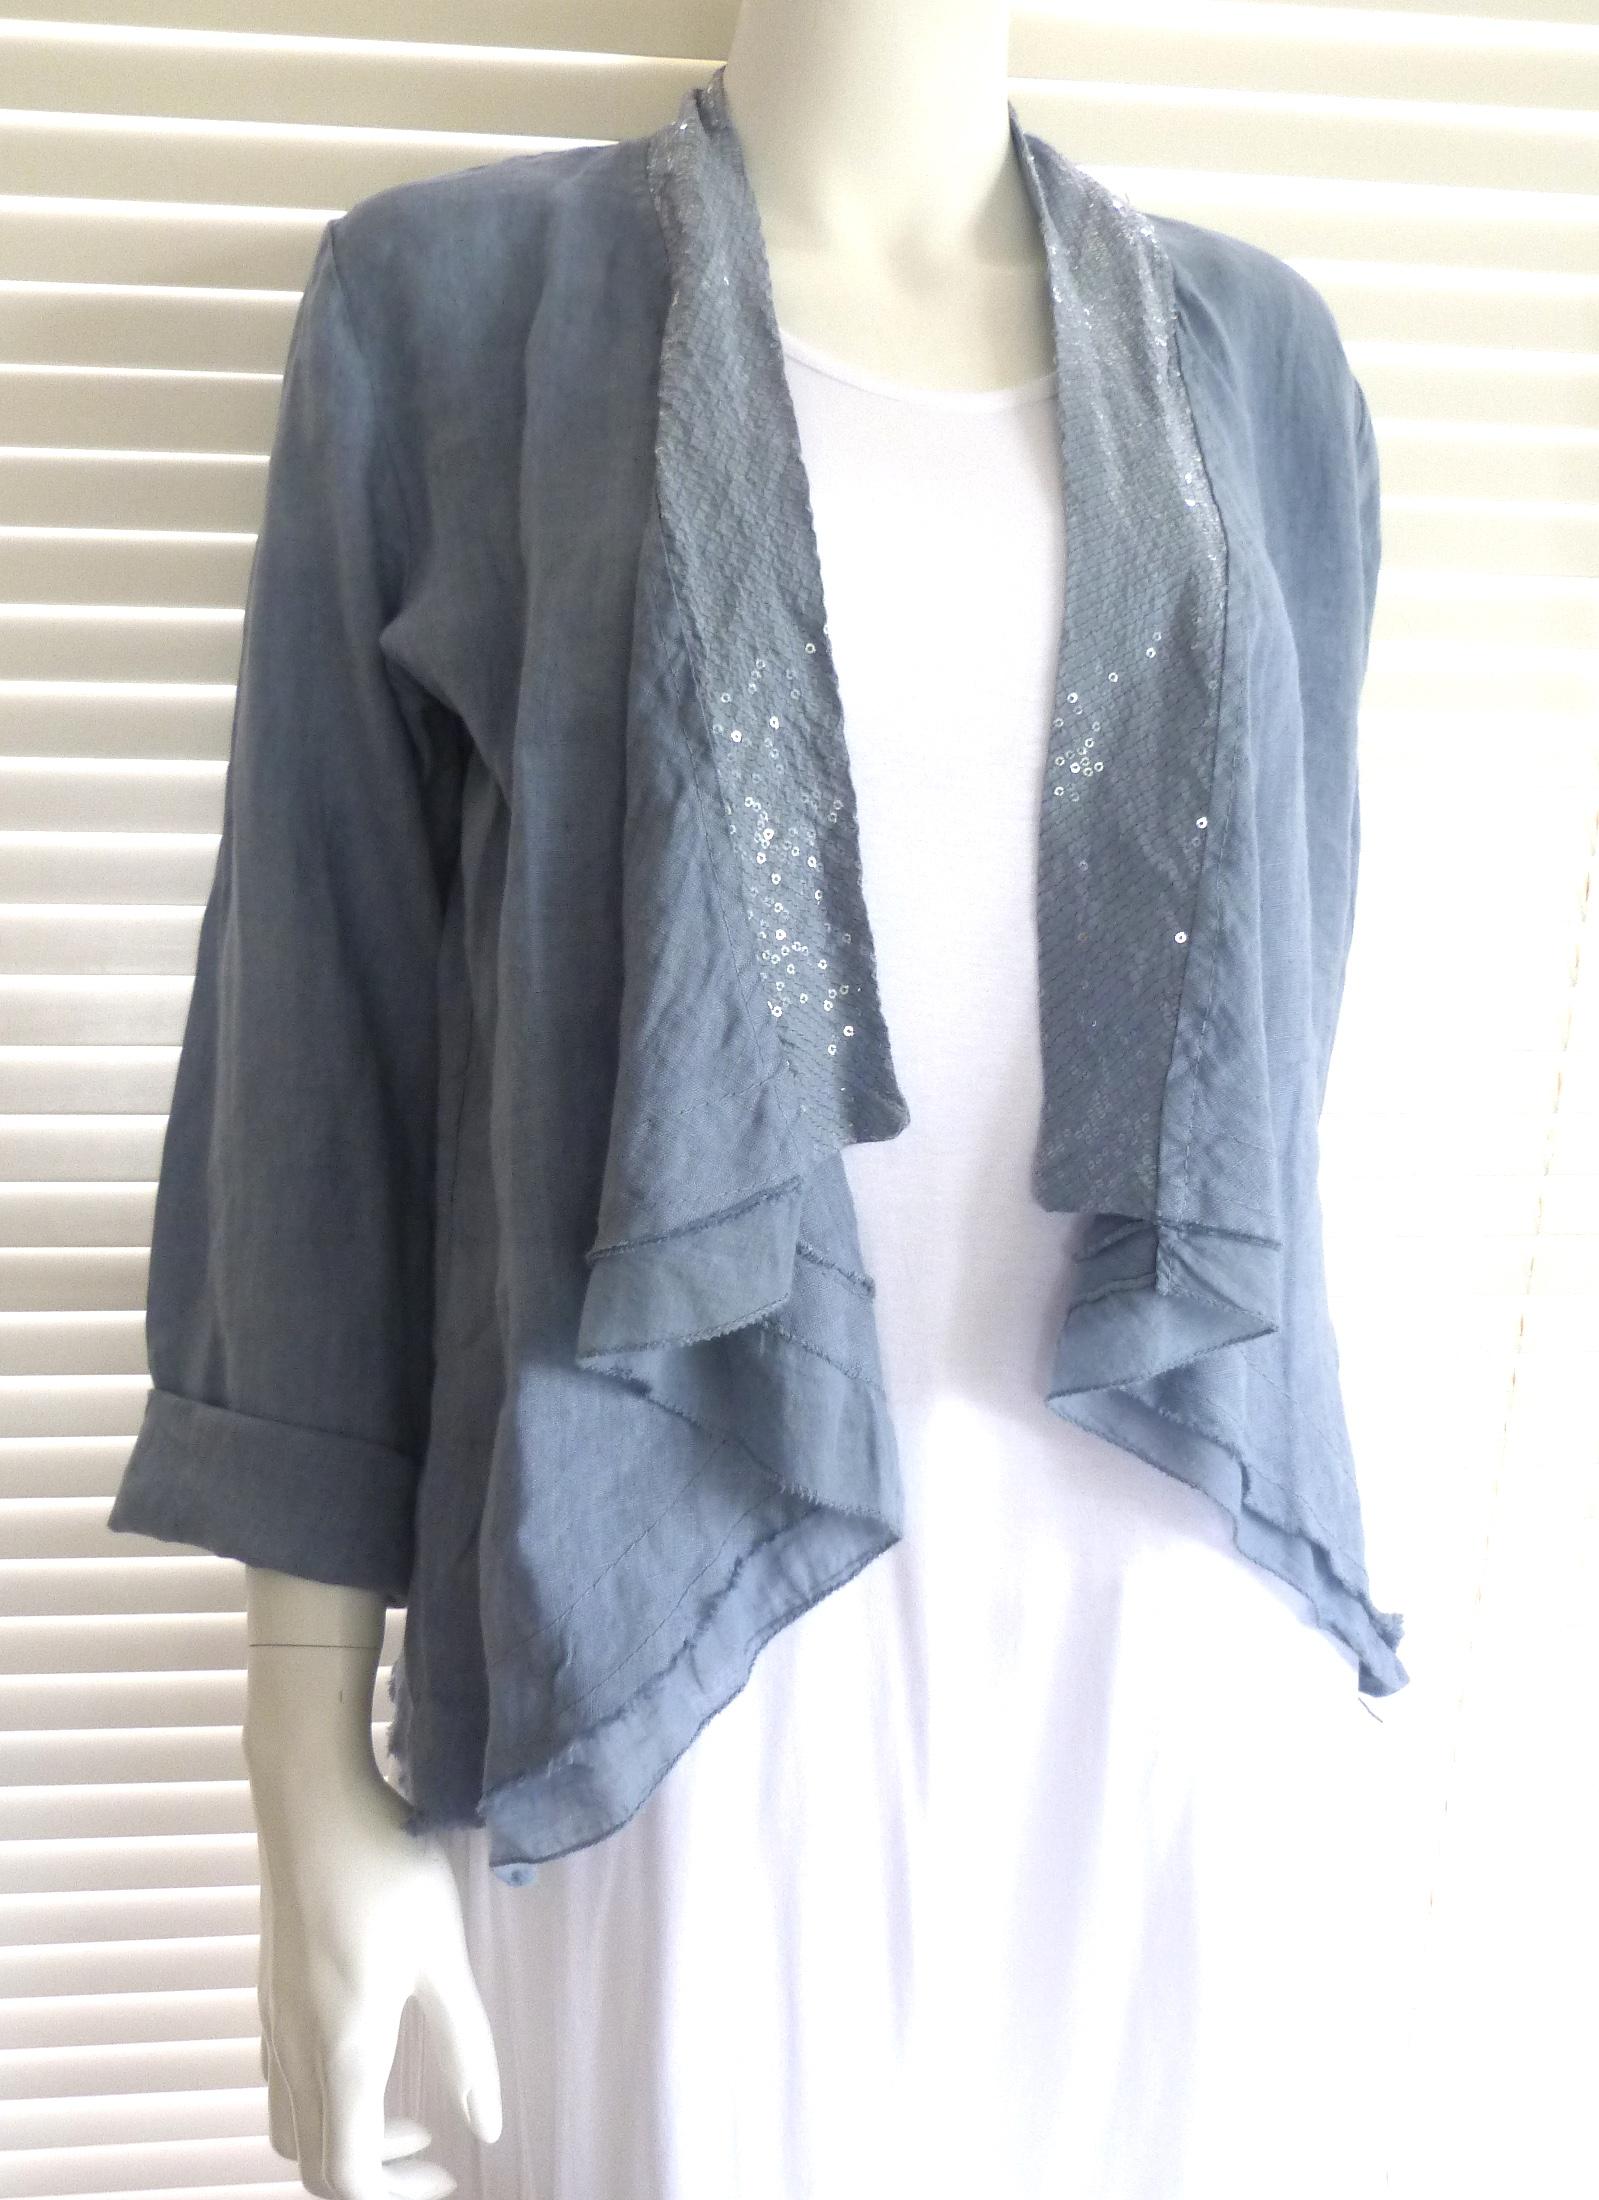 Fabulous Italian Linen Waterfall Style Jacket With Sequin